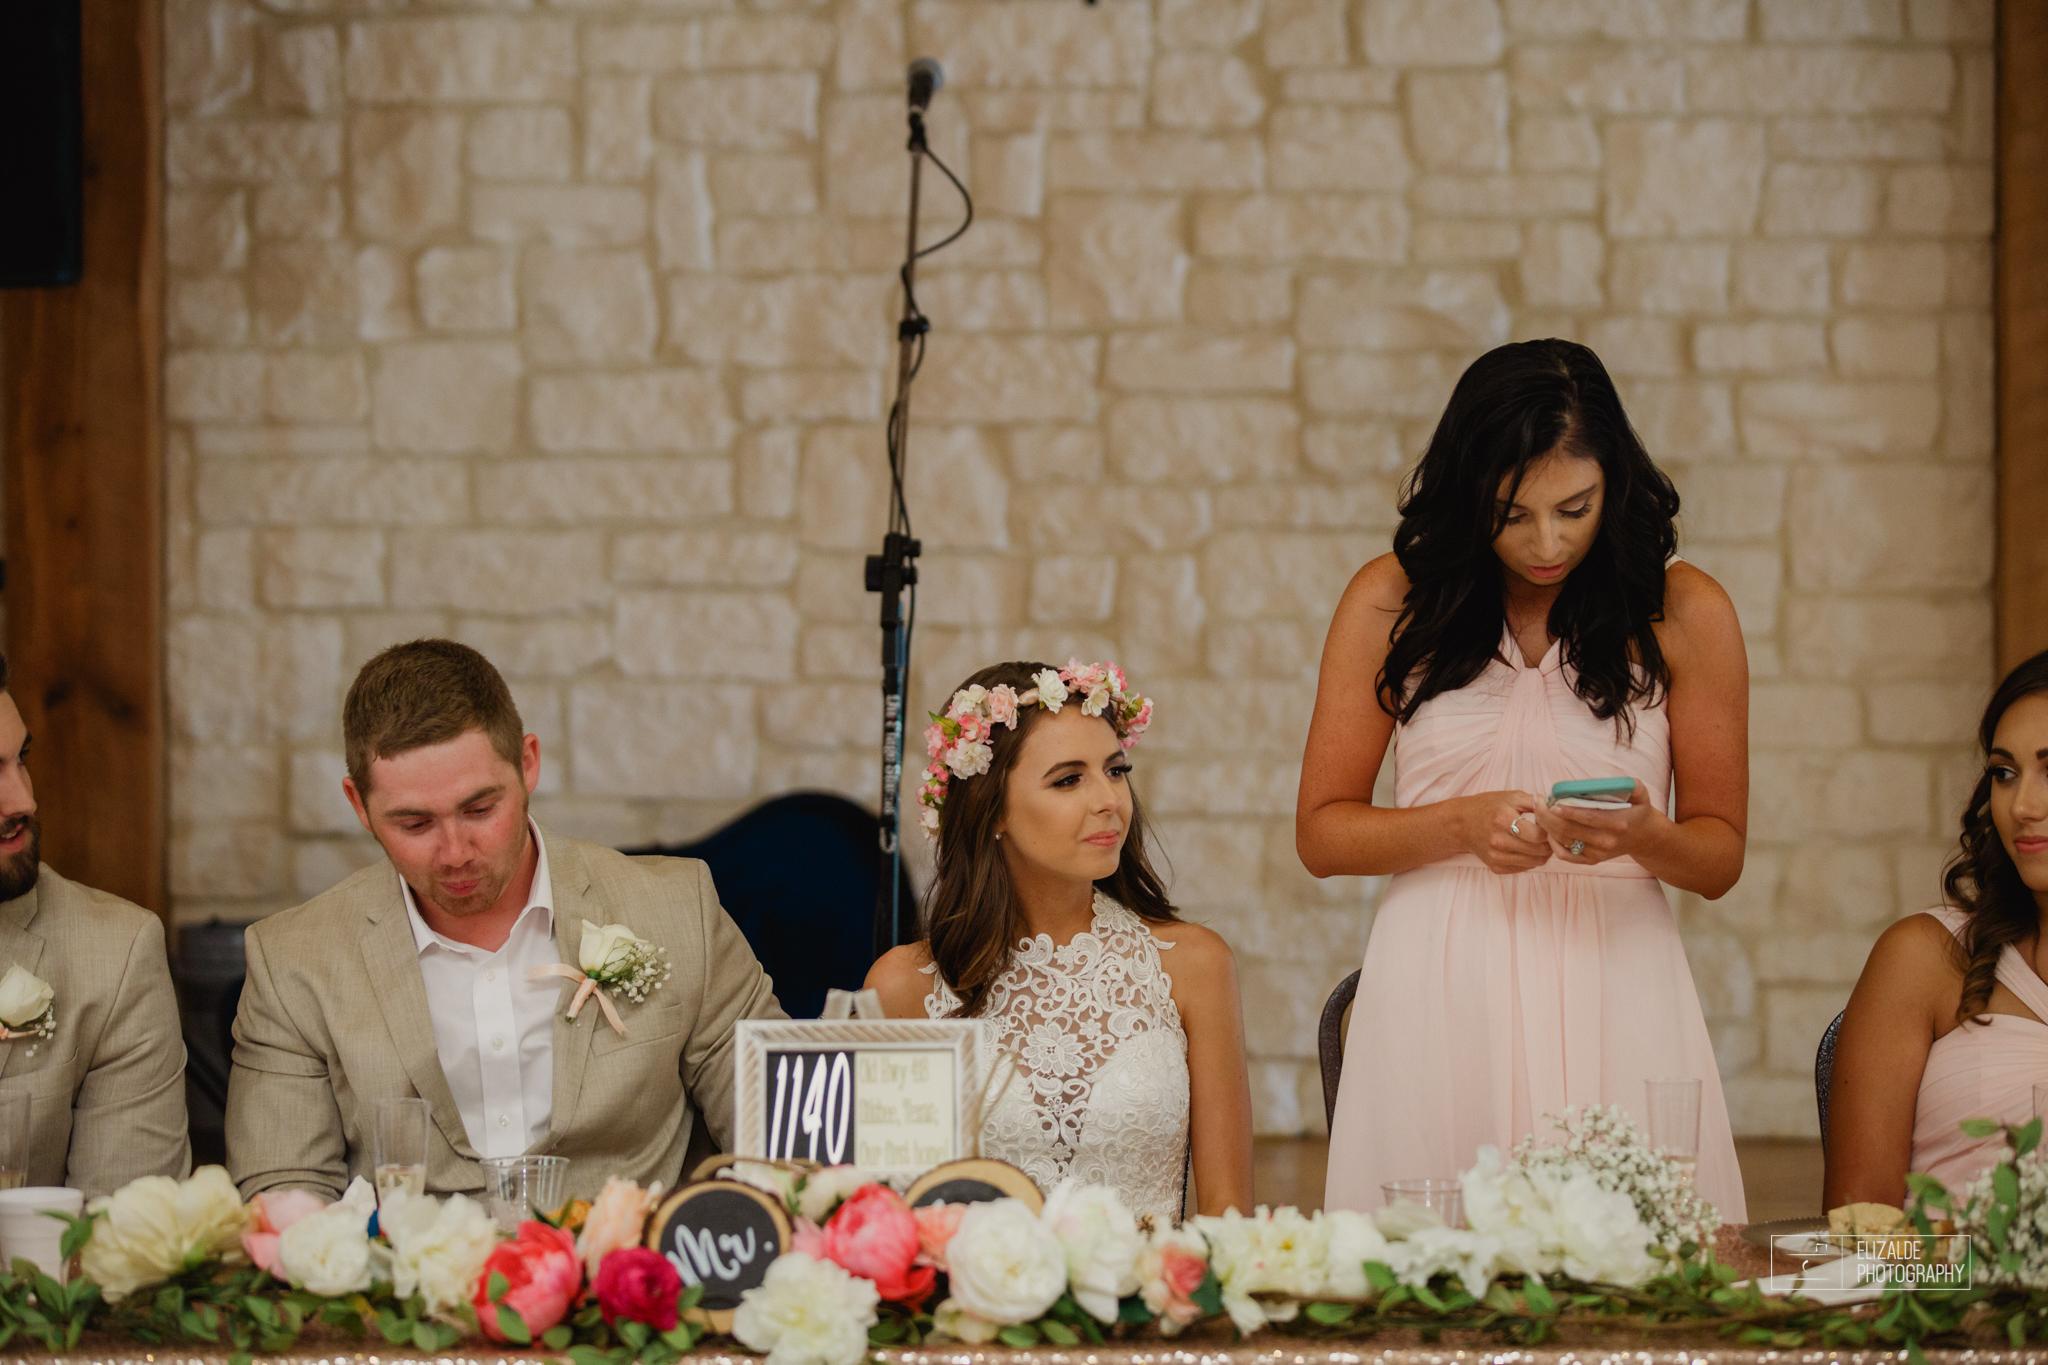 Wedding photographer Dallas_Elizalde Photography_DFW Wedding photographer_ Hickoty Hills_Wedding Photography (78 of 90).jpg